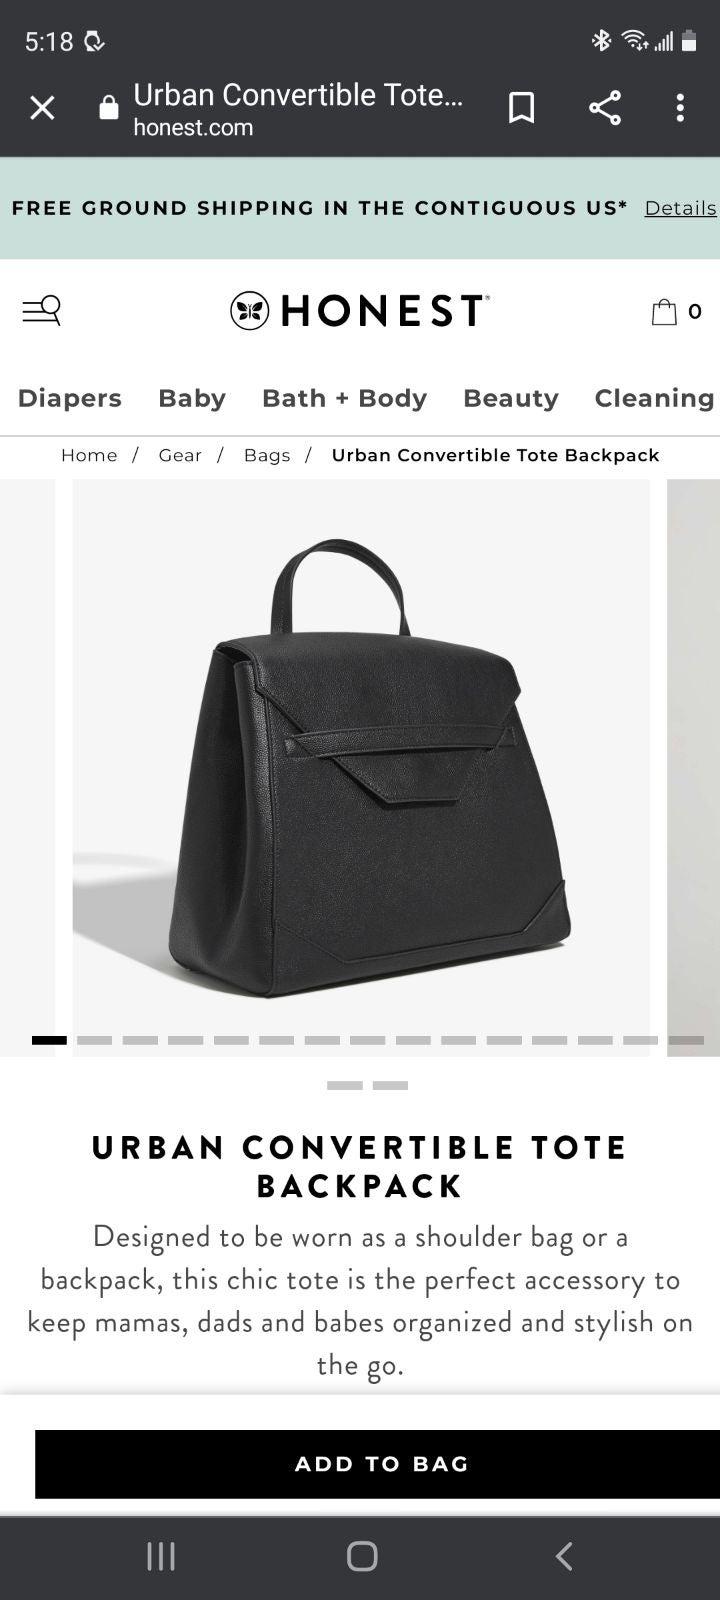 Honest urban convertible tote backpack